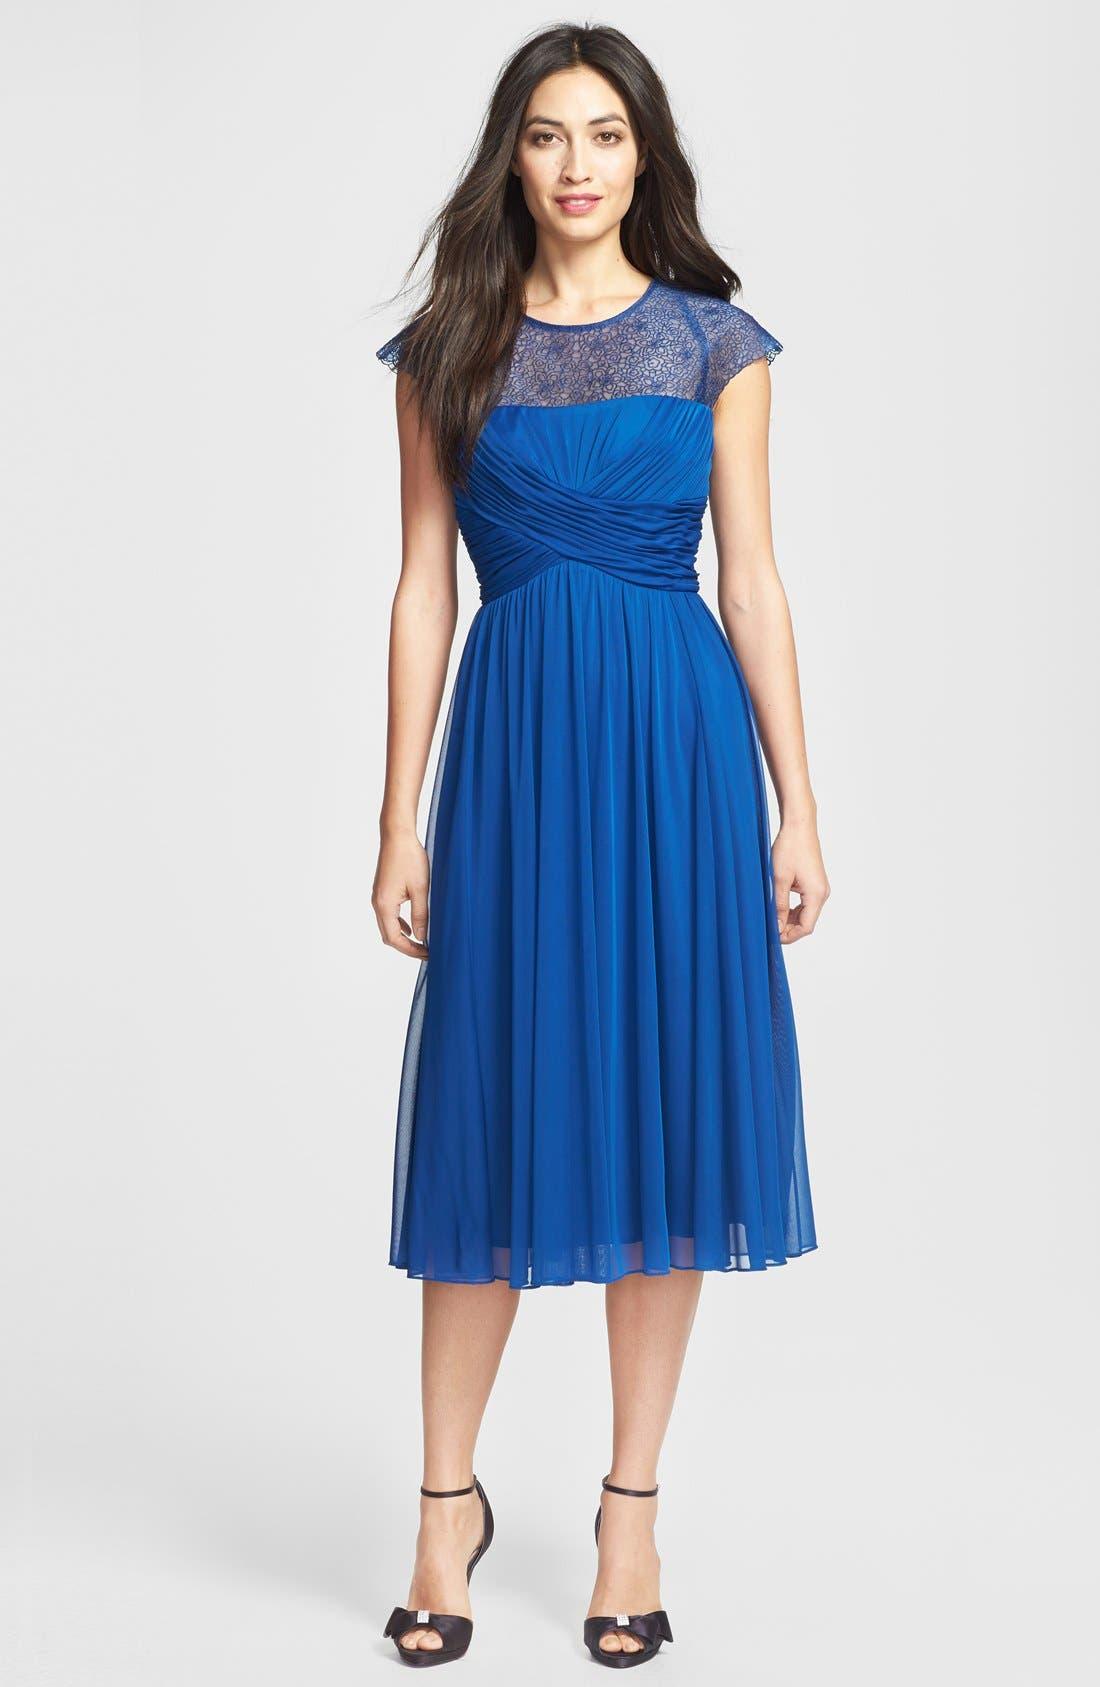 Alternate Image 1 Selected - Alex Evenings Ruched Cap Sleeve Tea Length Dress